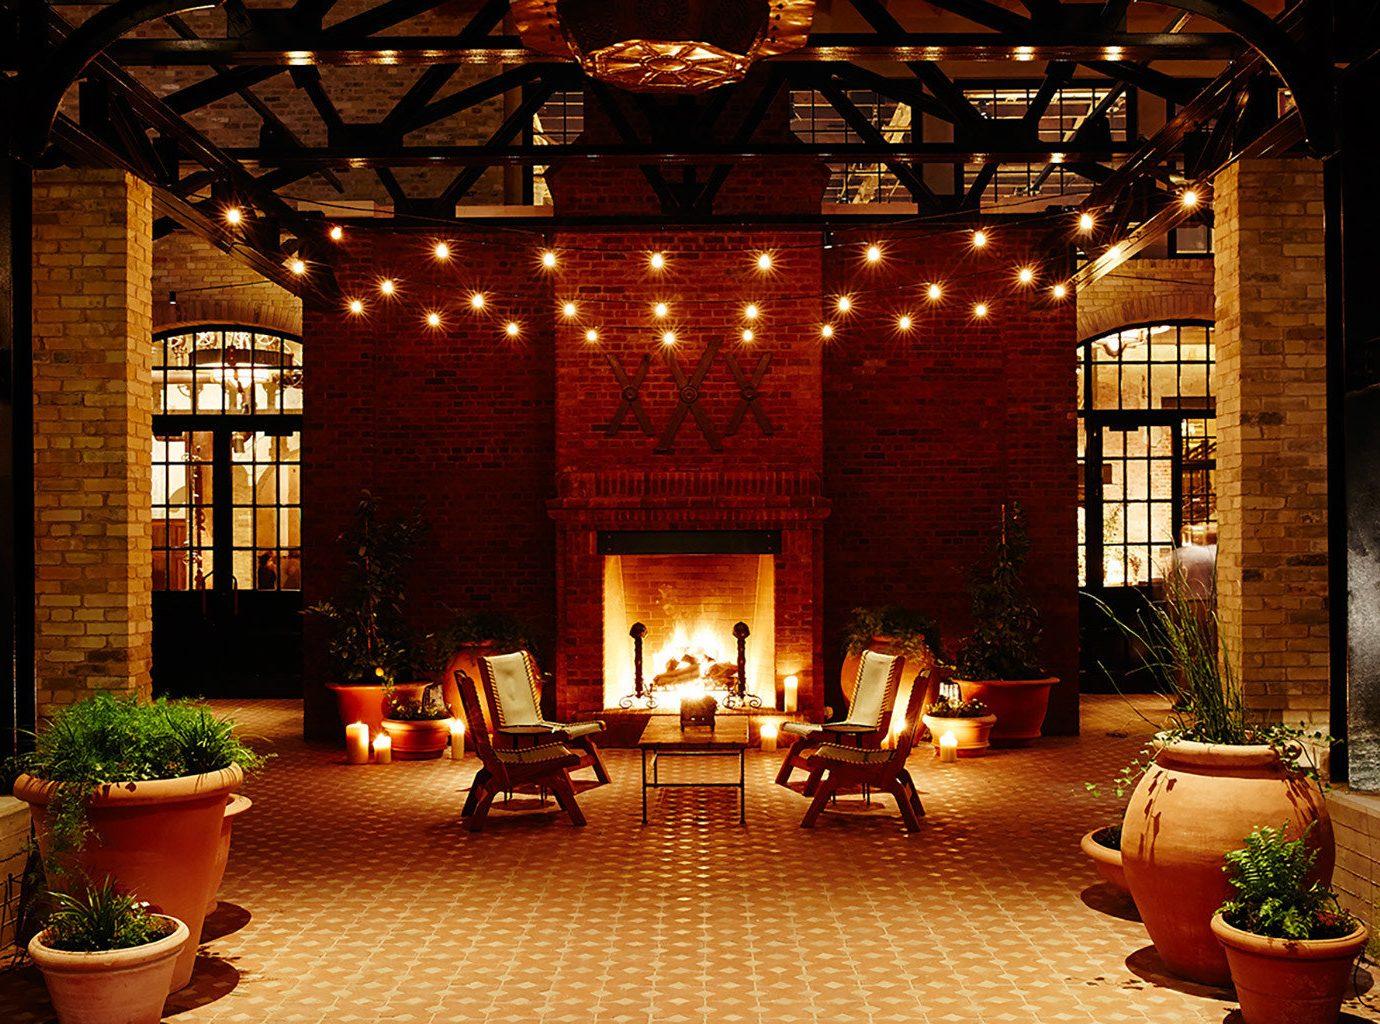 Trip Ideas Lobby indoor Living room building ceiling estate lighting interior design living room furniture area